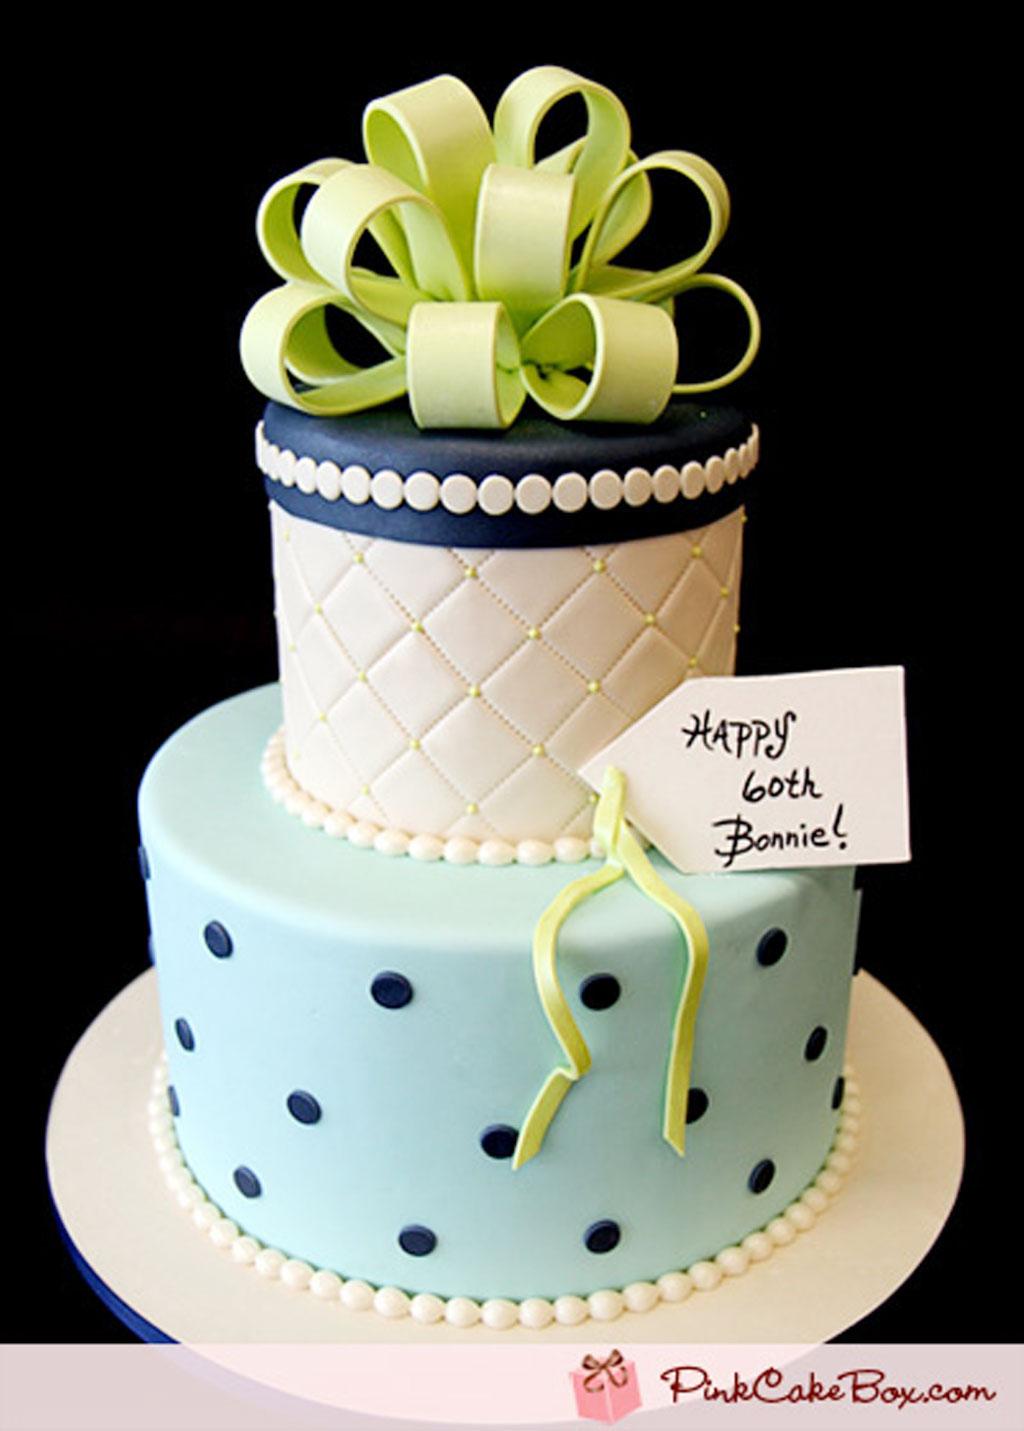 Girlfriend Personalised Birthday Cake Source Ideas For 70 Year Old Lady Nangguk Sticker